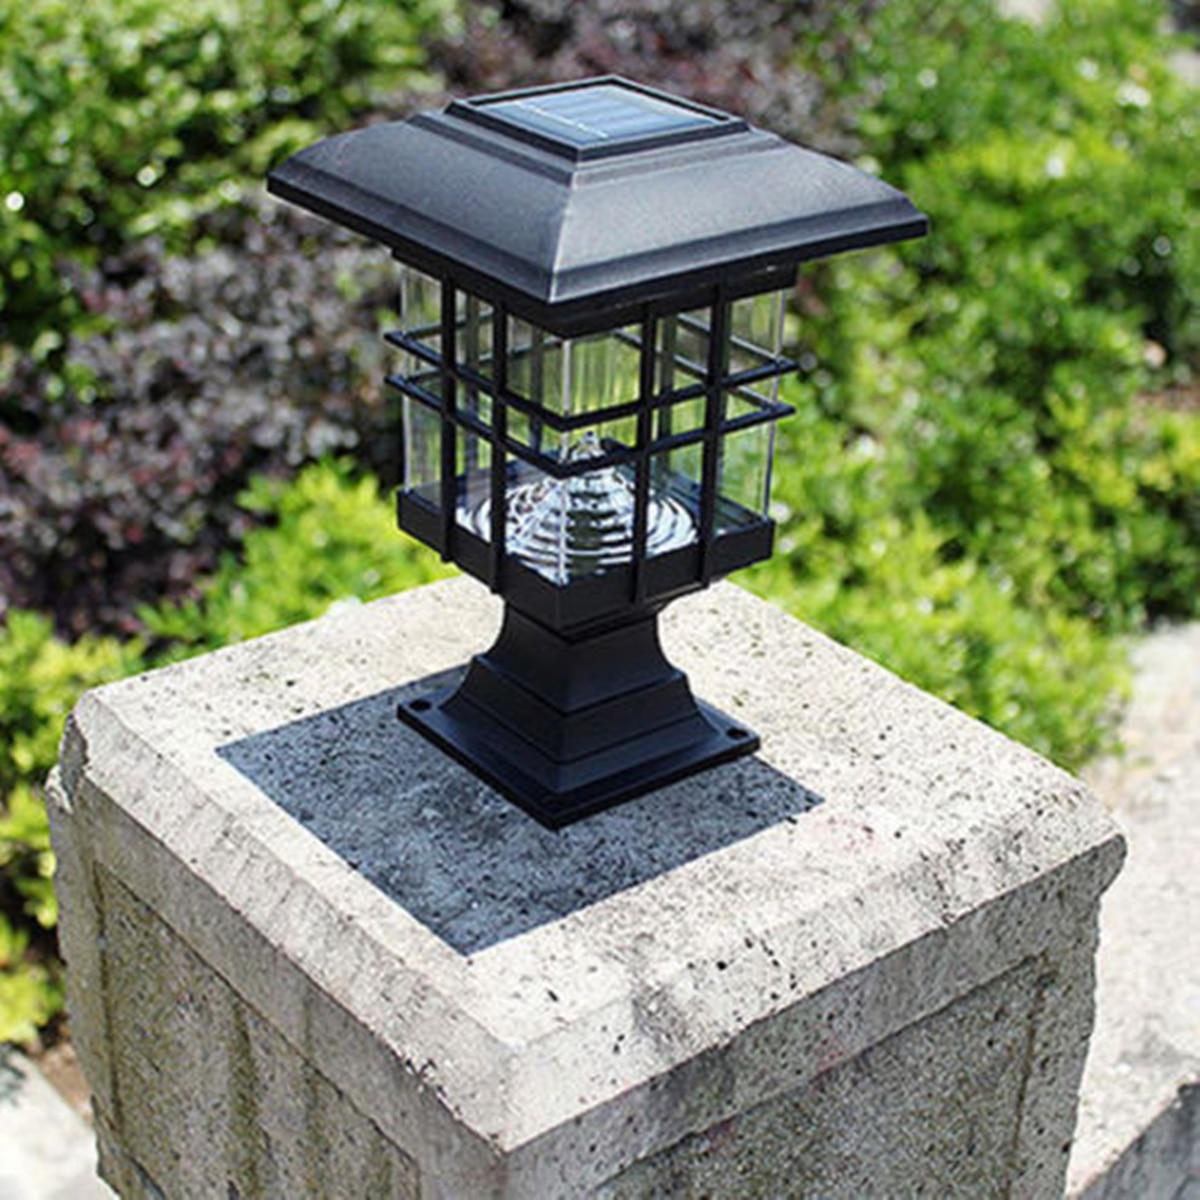 Palace Lantern LED Solar Powered Outdoor Lighting Garden Yard Landscape Light Gardening Pathway Decoration Light Sensor Lamps